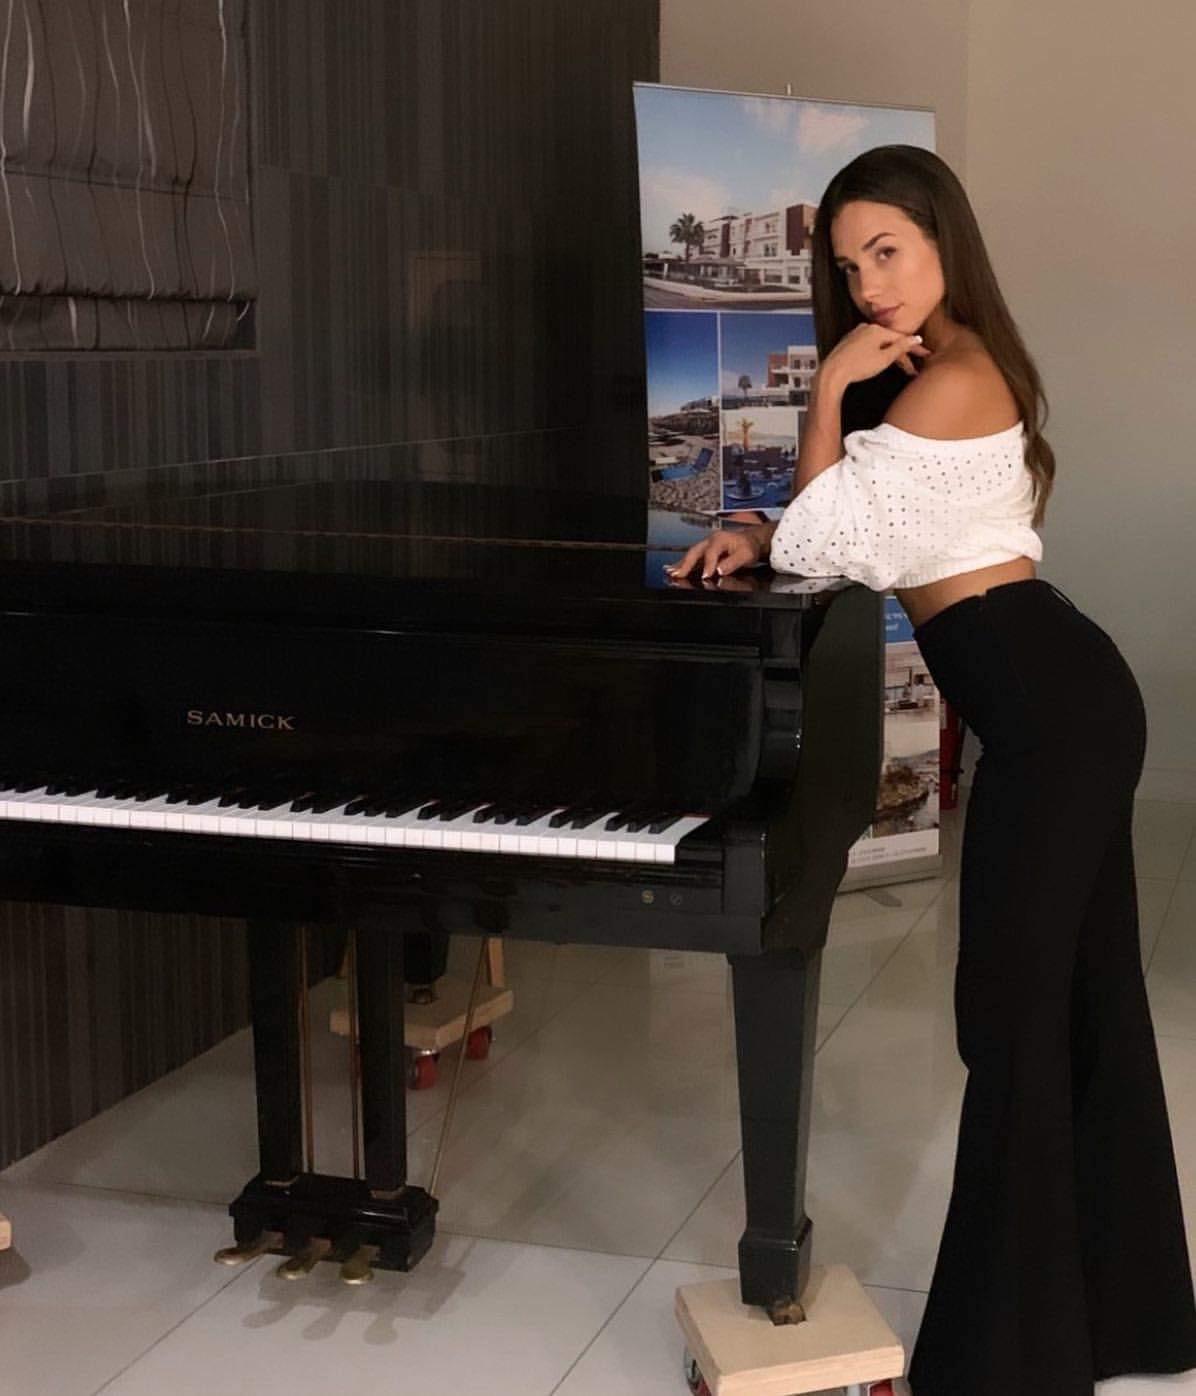 The Voice: Η 26χρονη Άννα από την Καλαμάτα, ανέβηκε για δεύτερη φορά στη σκηνή του show 14